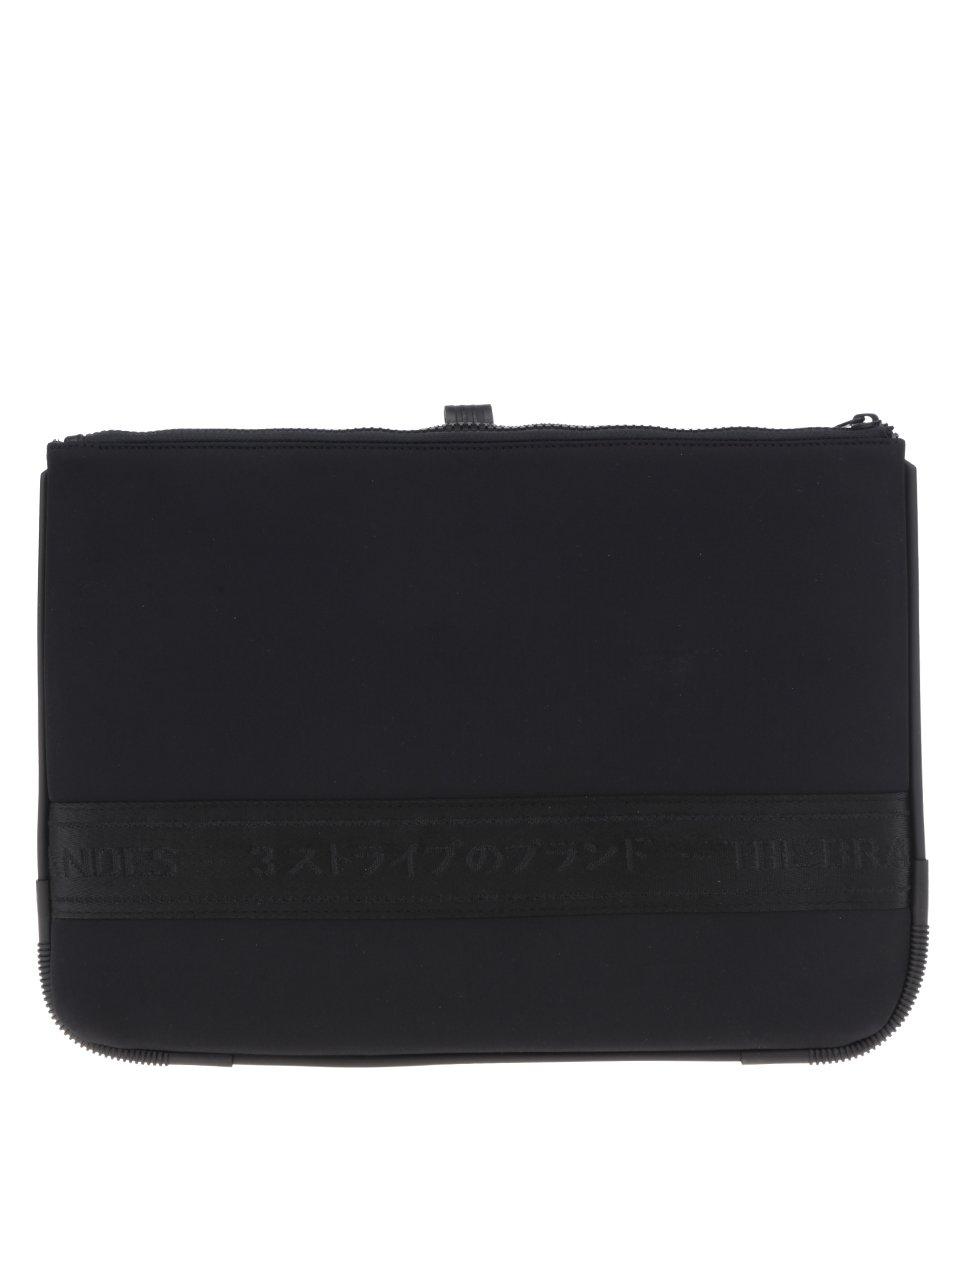 "Čierny obal na notebook adidas Originals 13"""